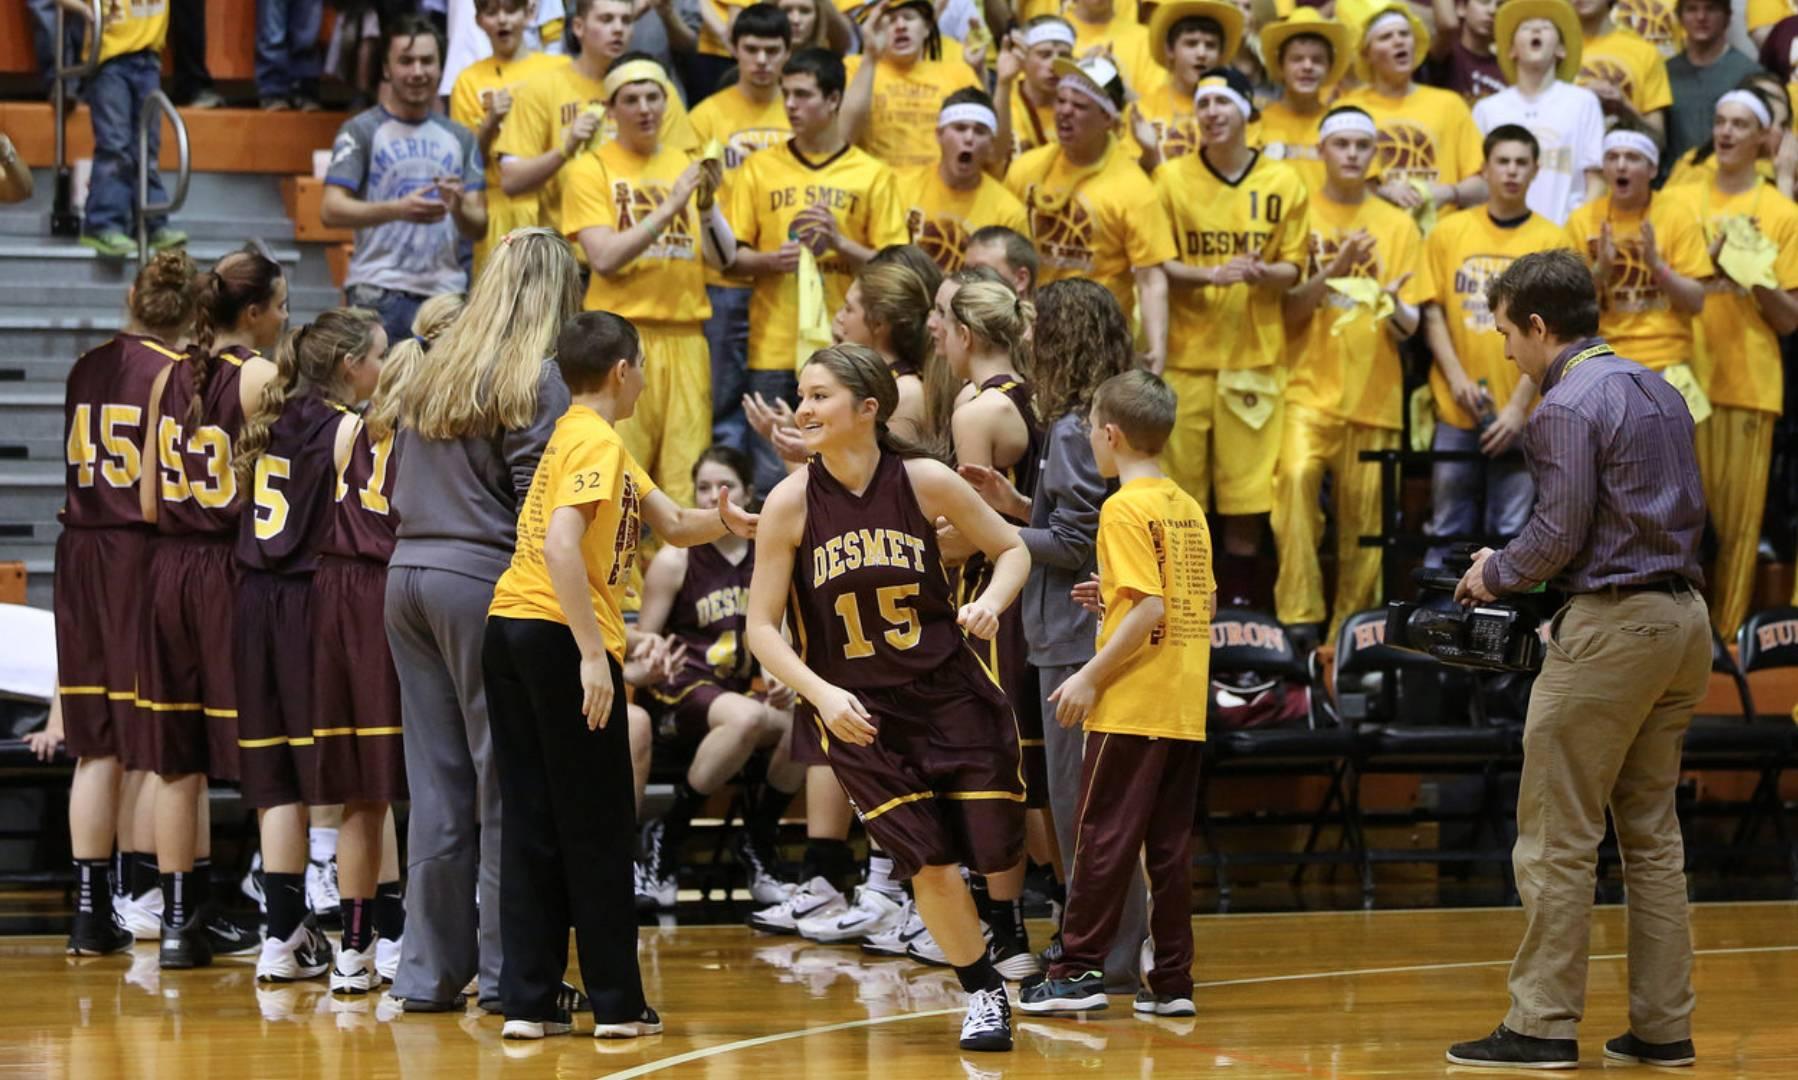 Desmet girls basketball team